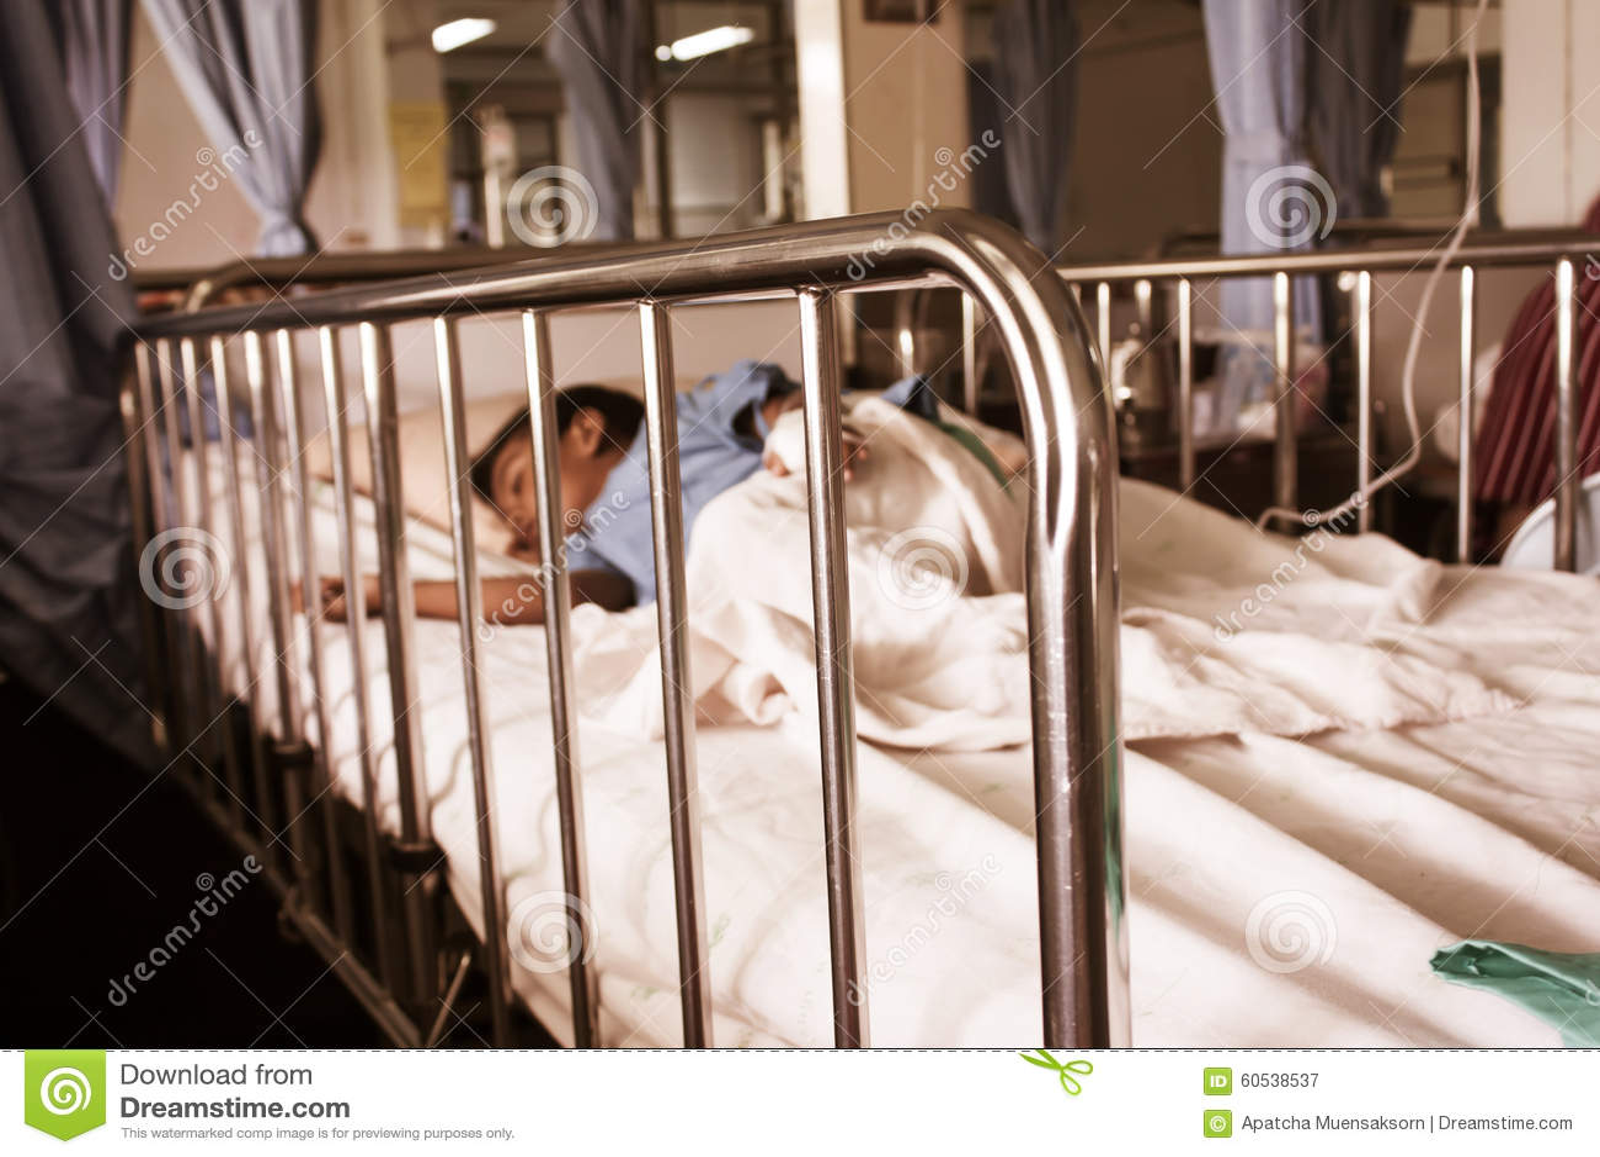 Boy Sleep On The Bed,little Boy Sick In The Hospital Stock ...